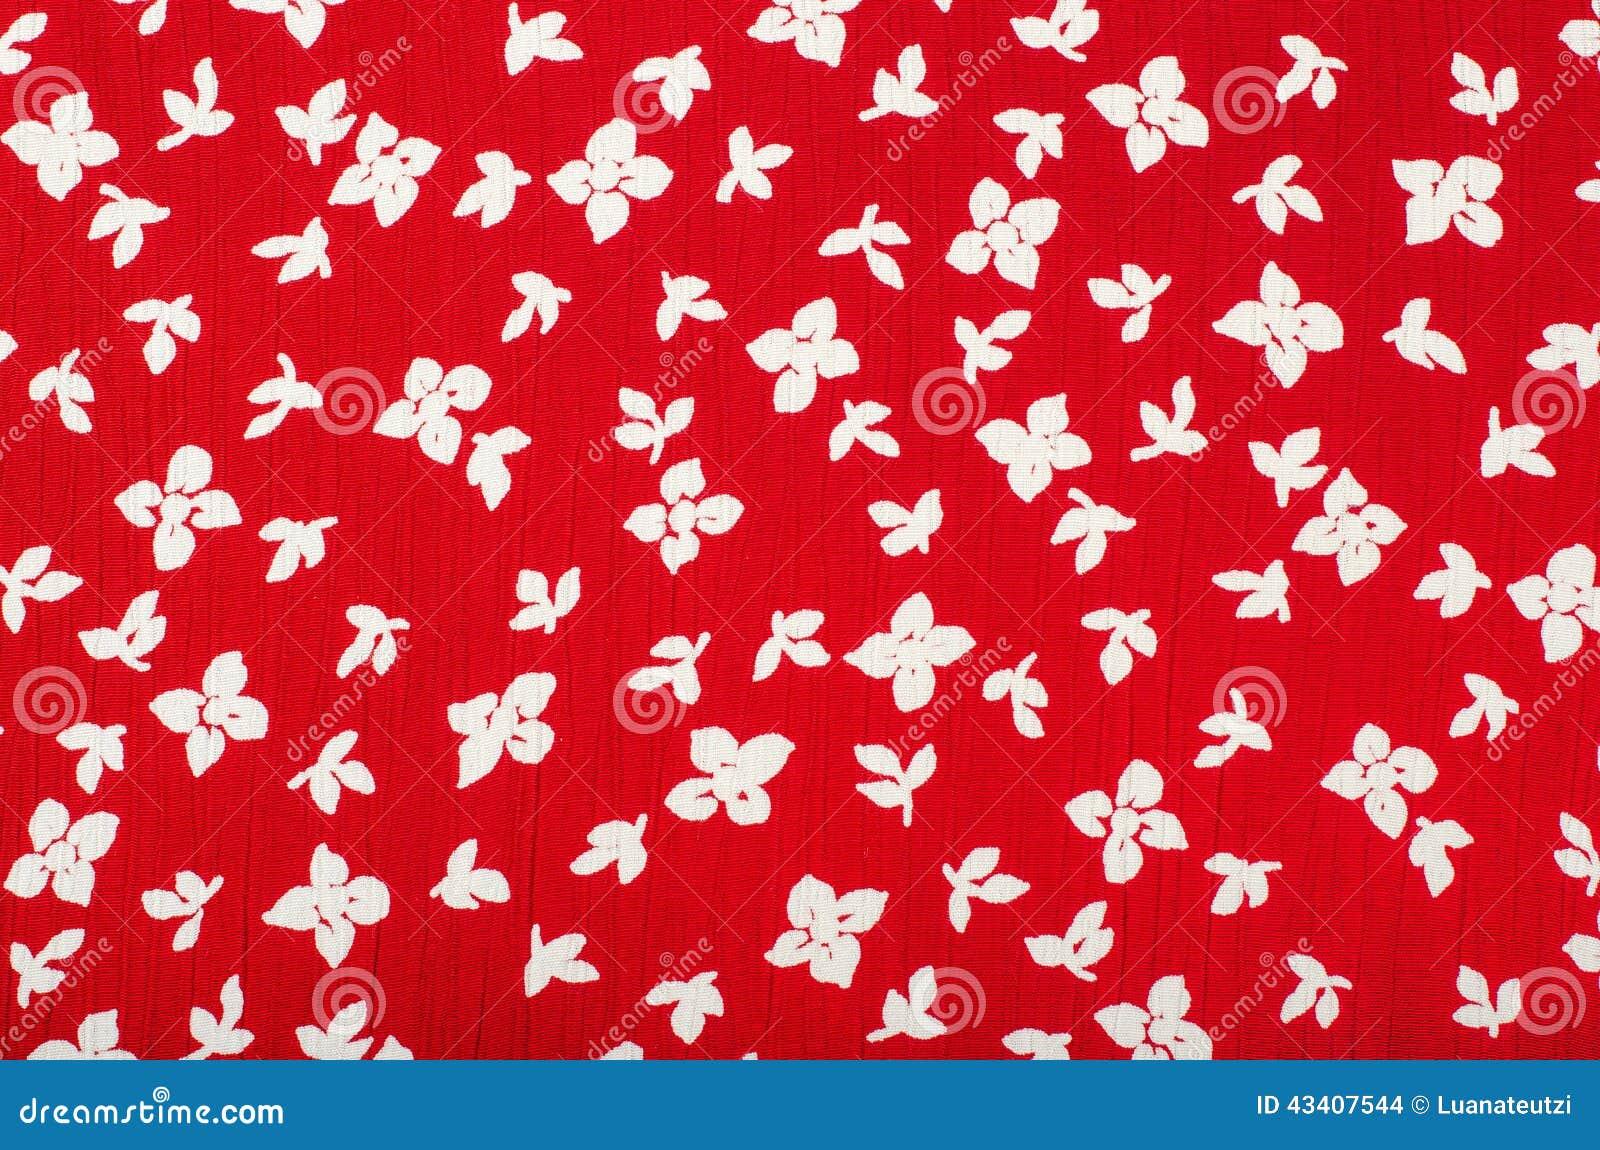 2000 Free Floral Pattern amp Pattern Images  Pixabay